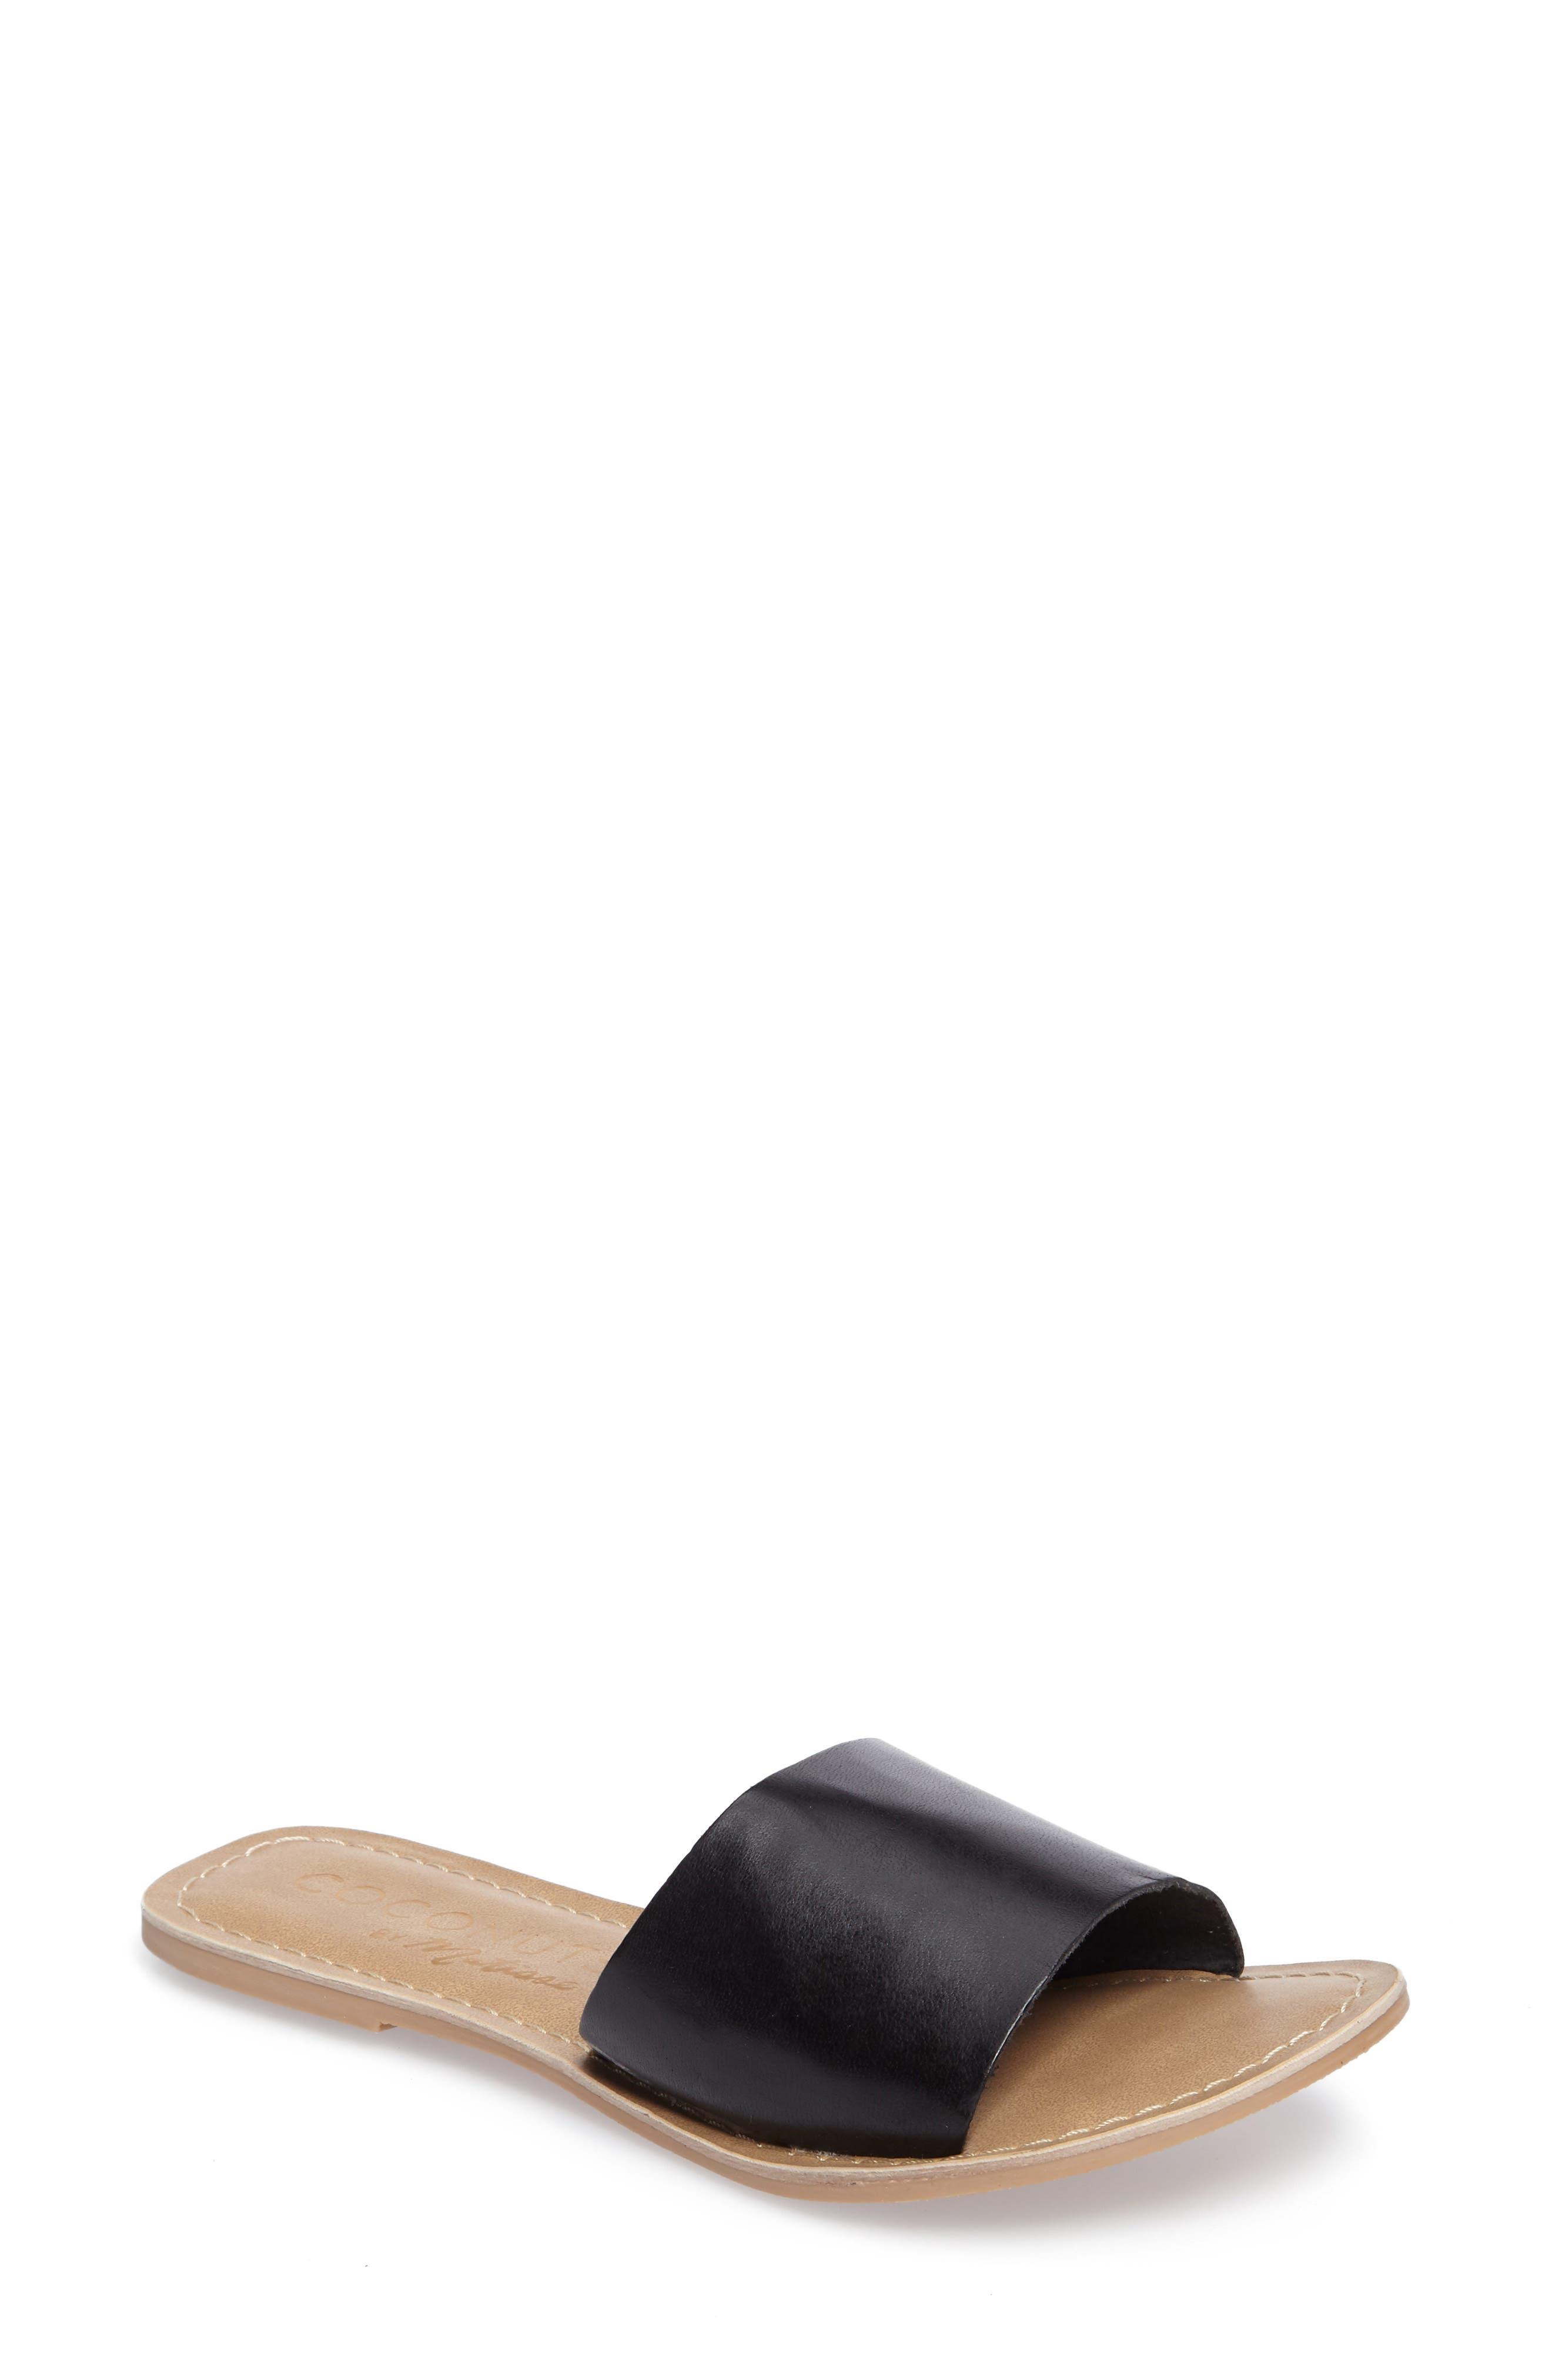 COCONUTS BY MATISSE Cabana Genuine Calf Hair Slide Sandal, Main, color, 001